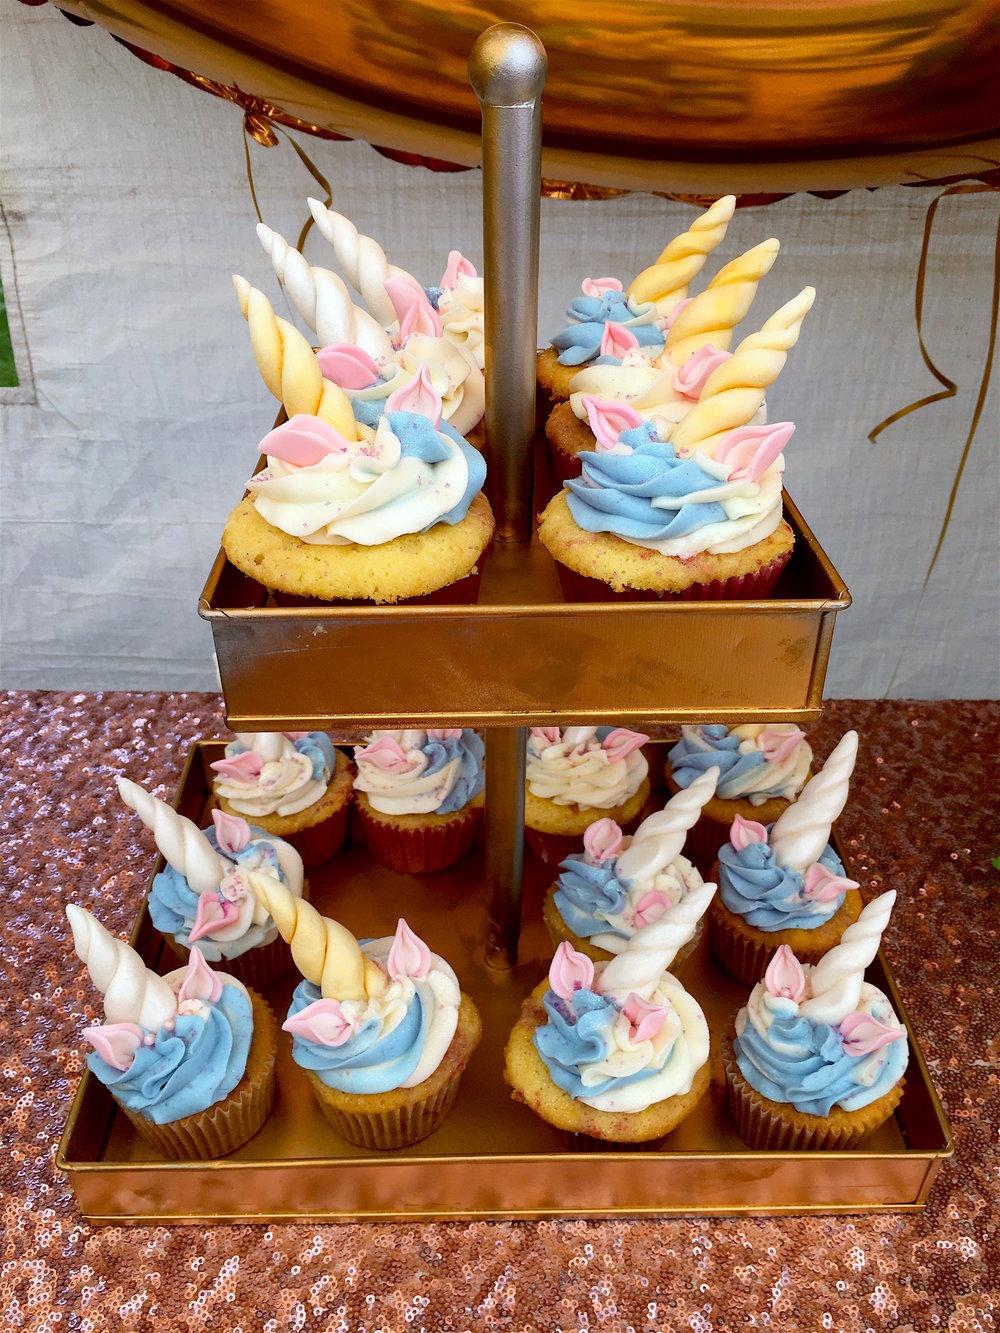 strawberries & cream unicorn cupcakes with vanilla bean buttercream